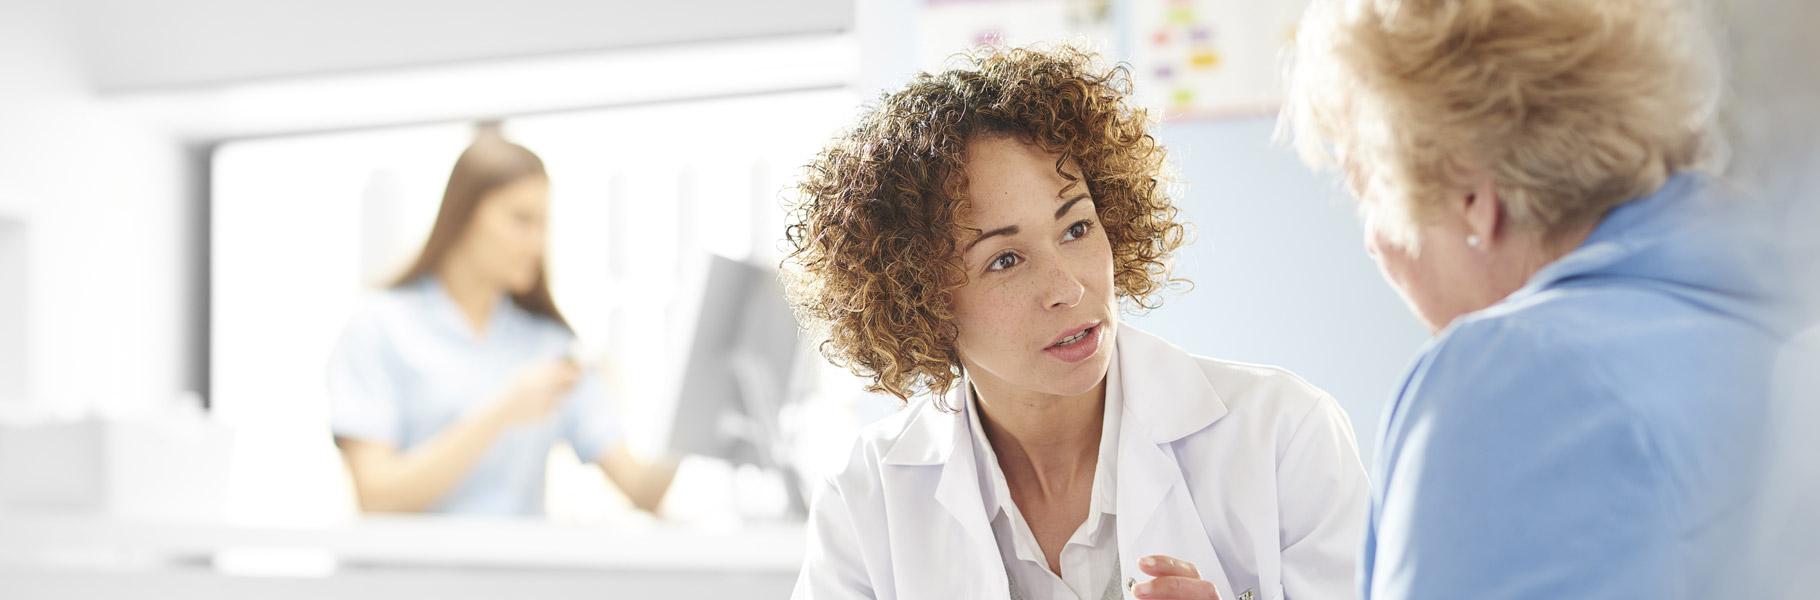 KL2 Multidisciplinary Clinical Research Career Development Program